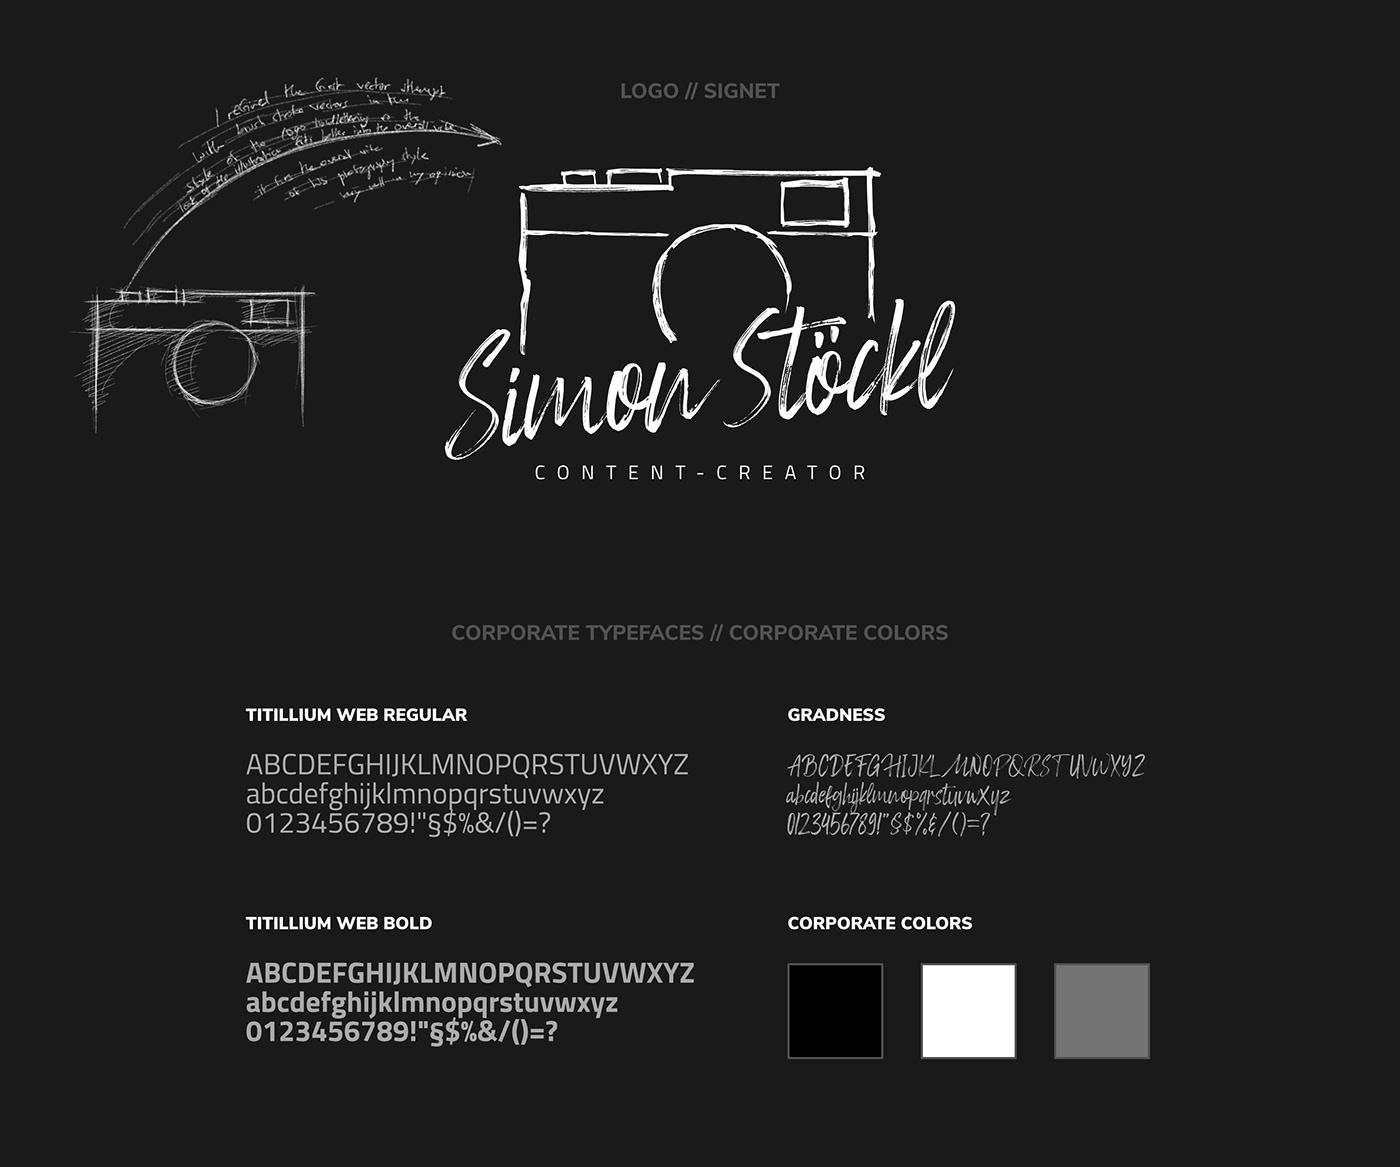 SIMON STÖCKL // Logo + Typefaces